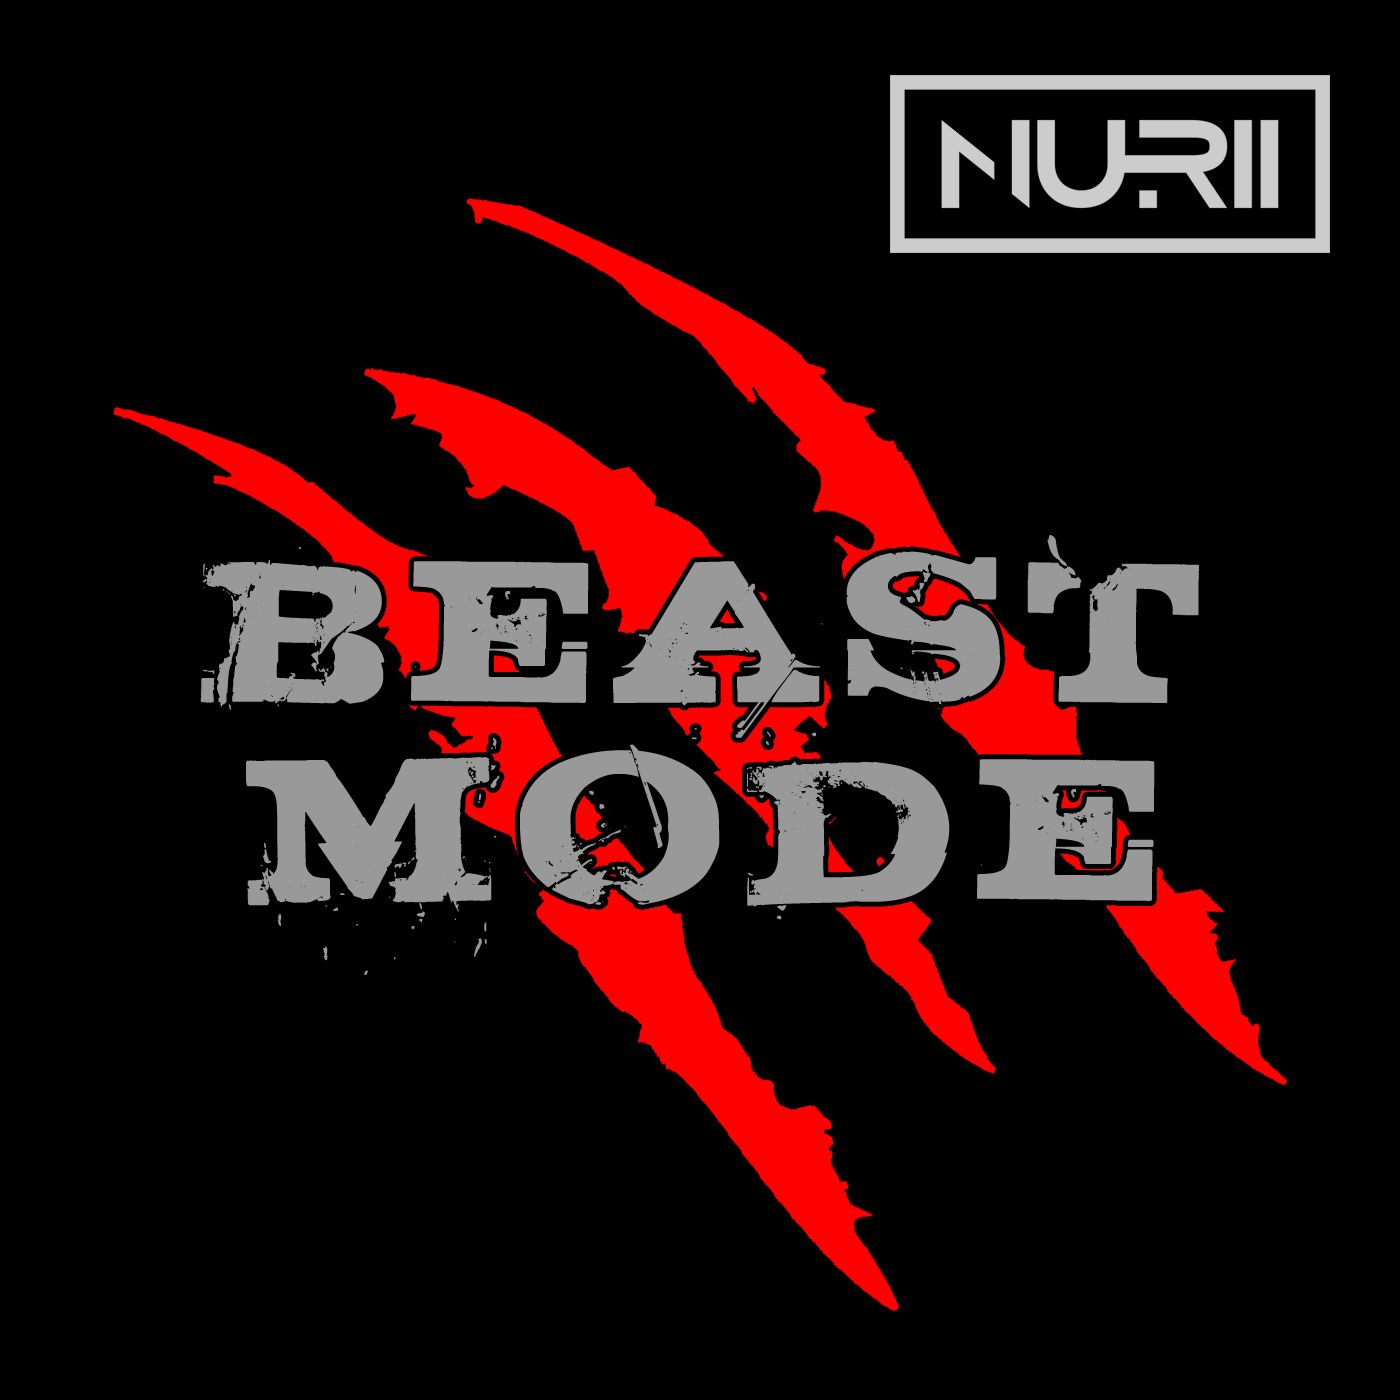 nurii_-_beast_mode.jpg